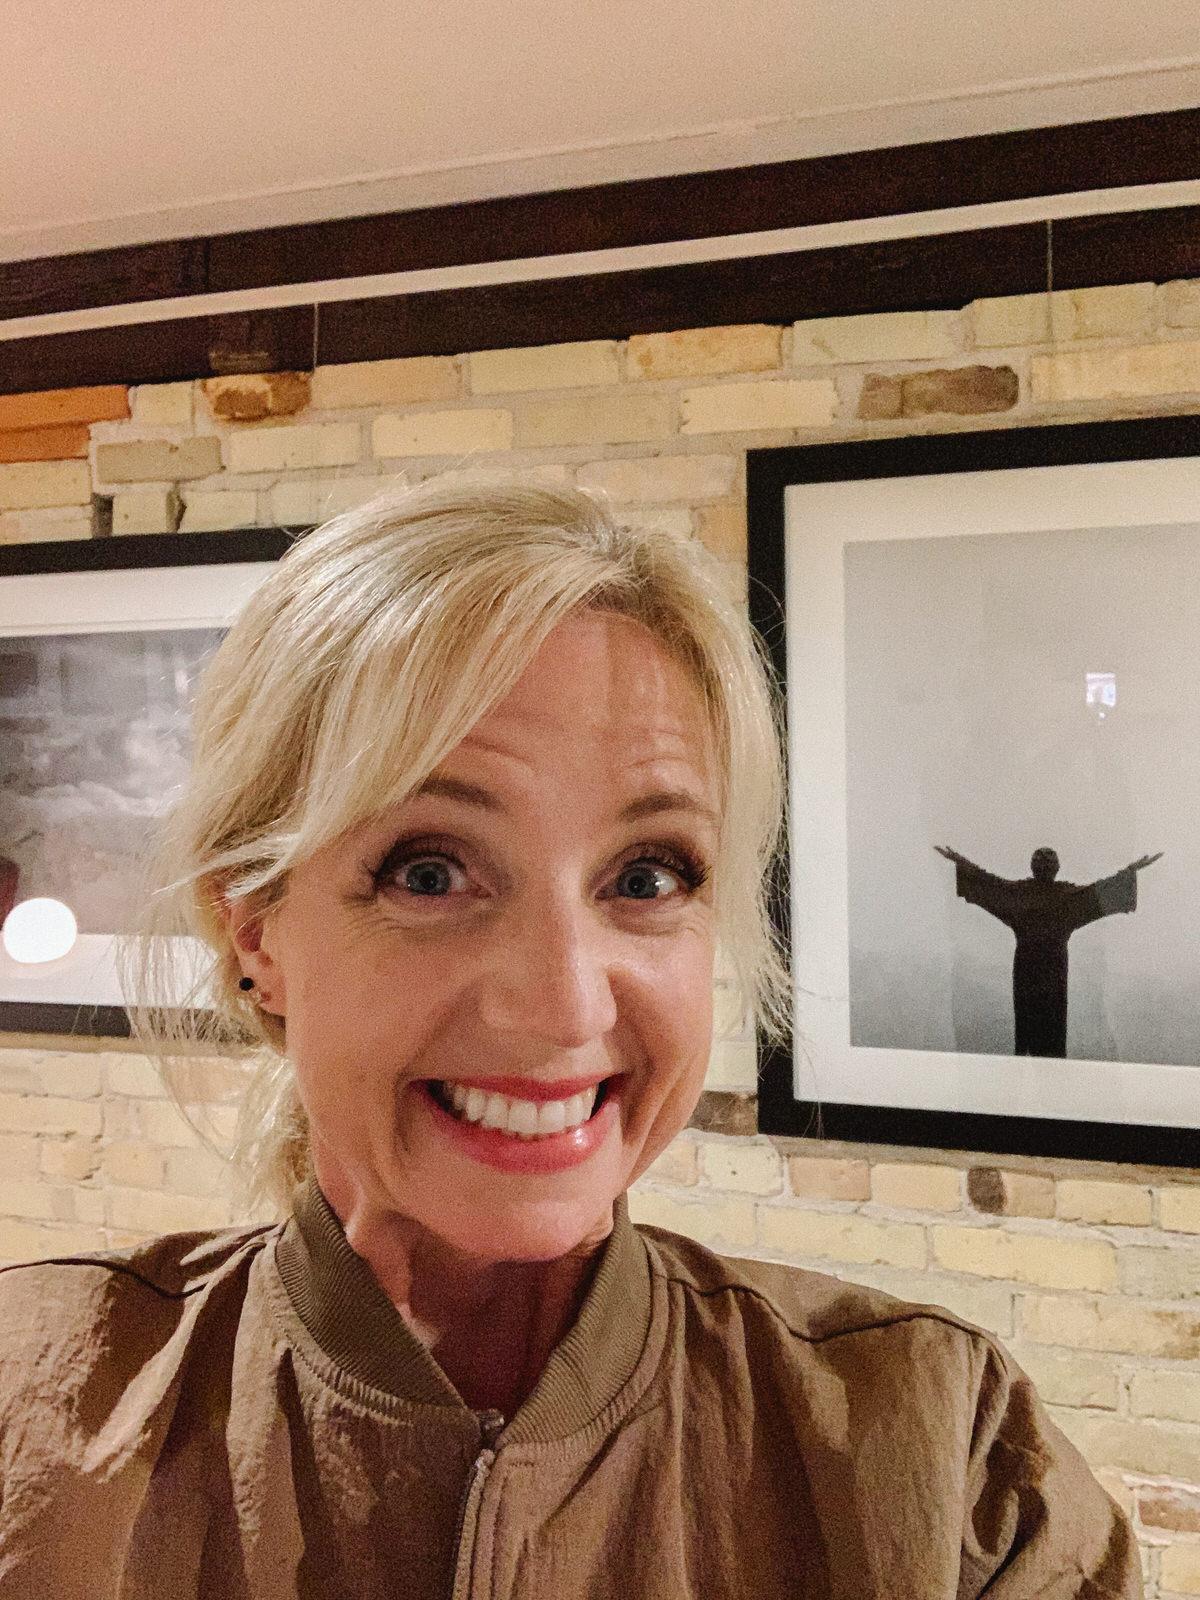 Self-Portrait-Studio-L-Photographer-Laura-Schneider-at-art-exhibition-Honey-and-Ace-_7597